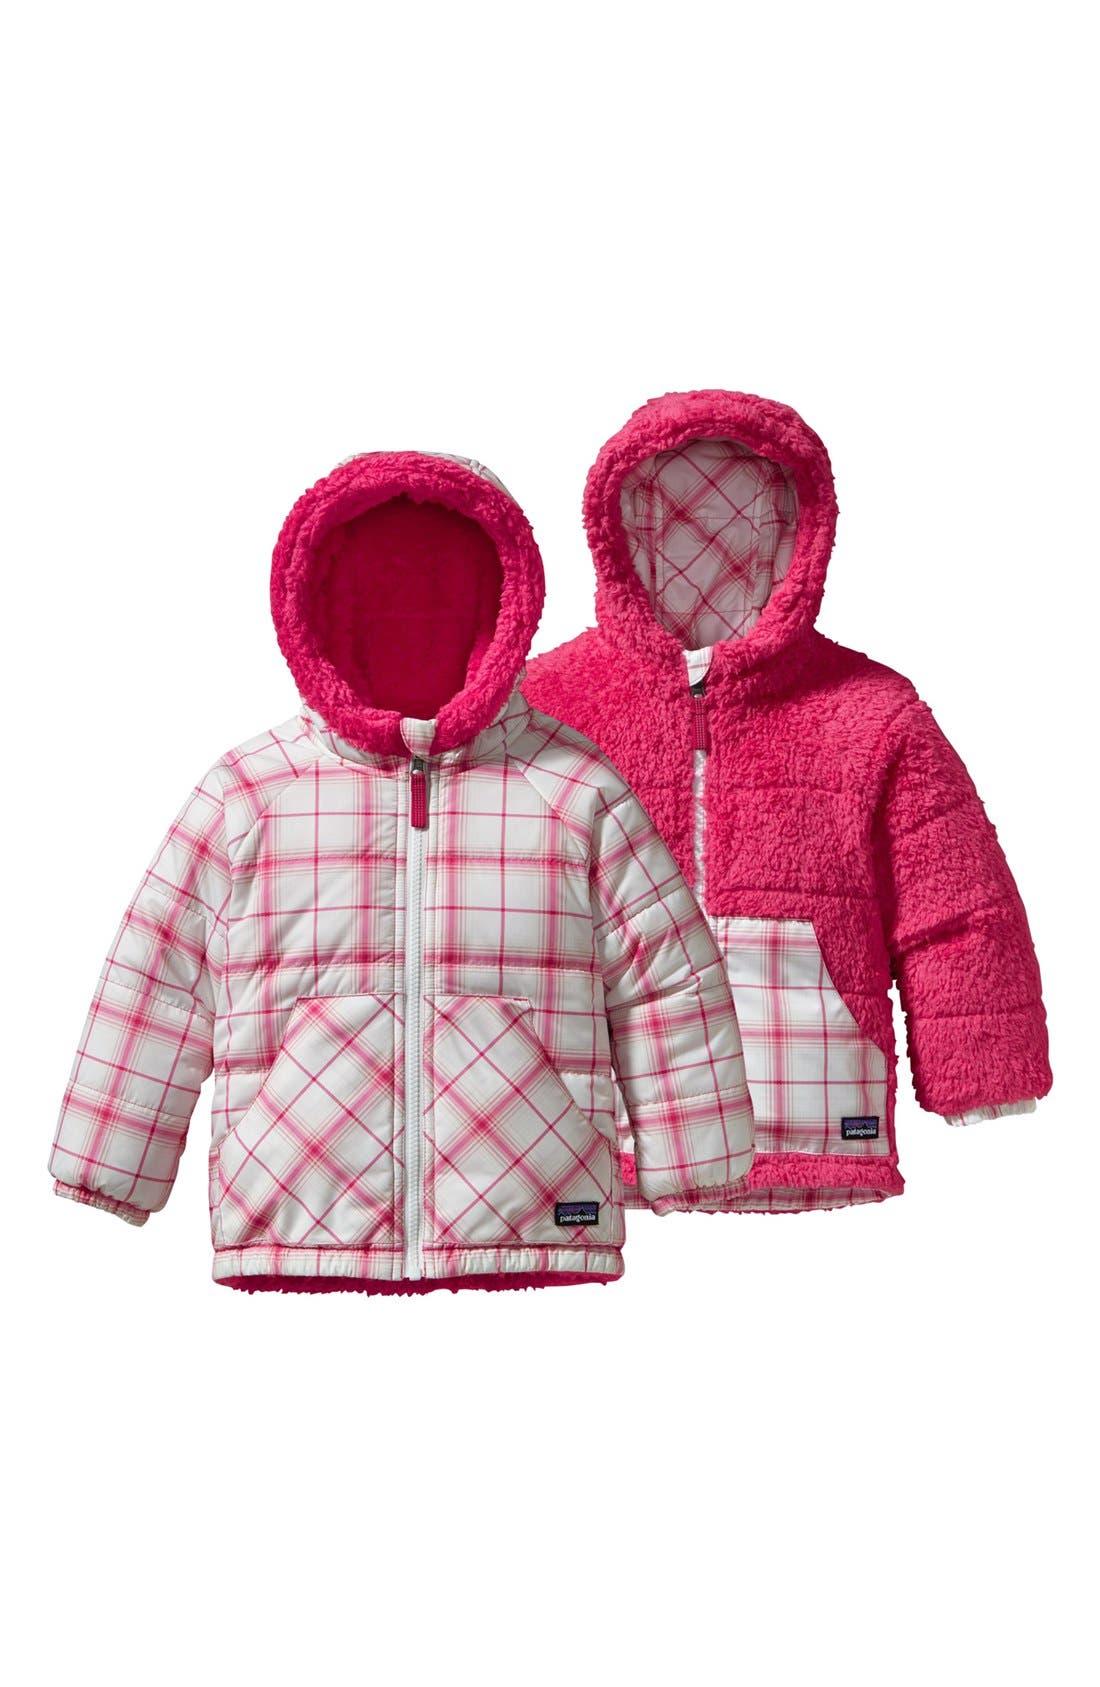 Alternate Image 1 Selected - Patagonia 'Tribbles' Reversible Jacket (Toddler Girls)